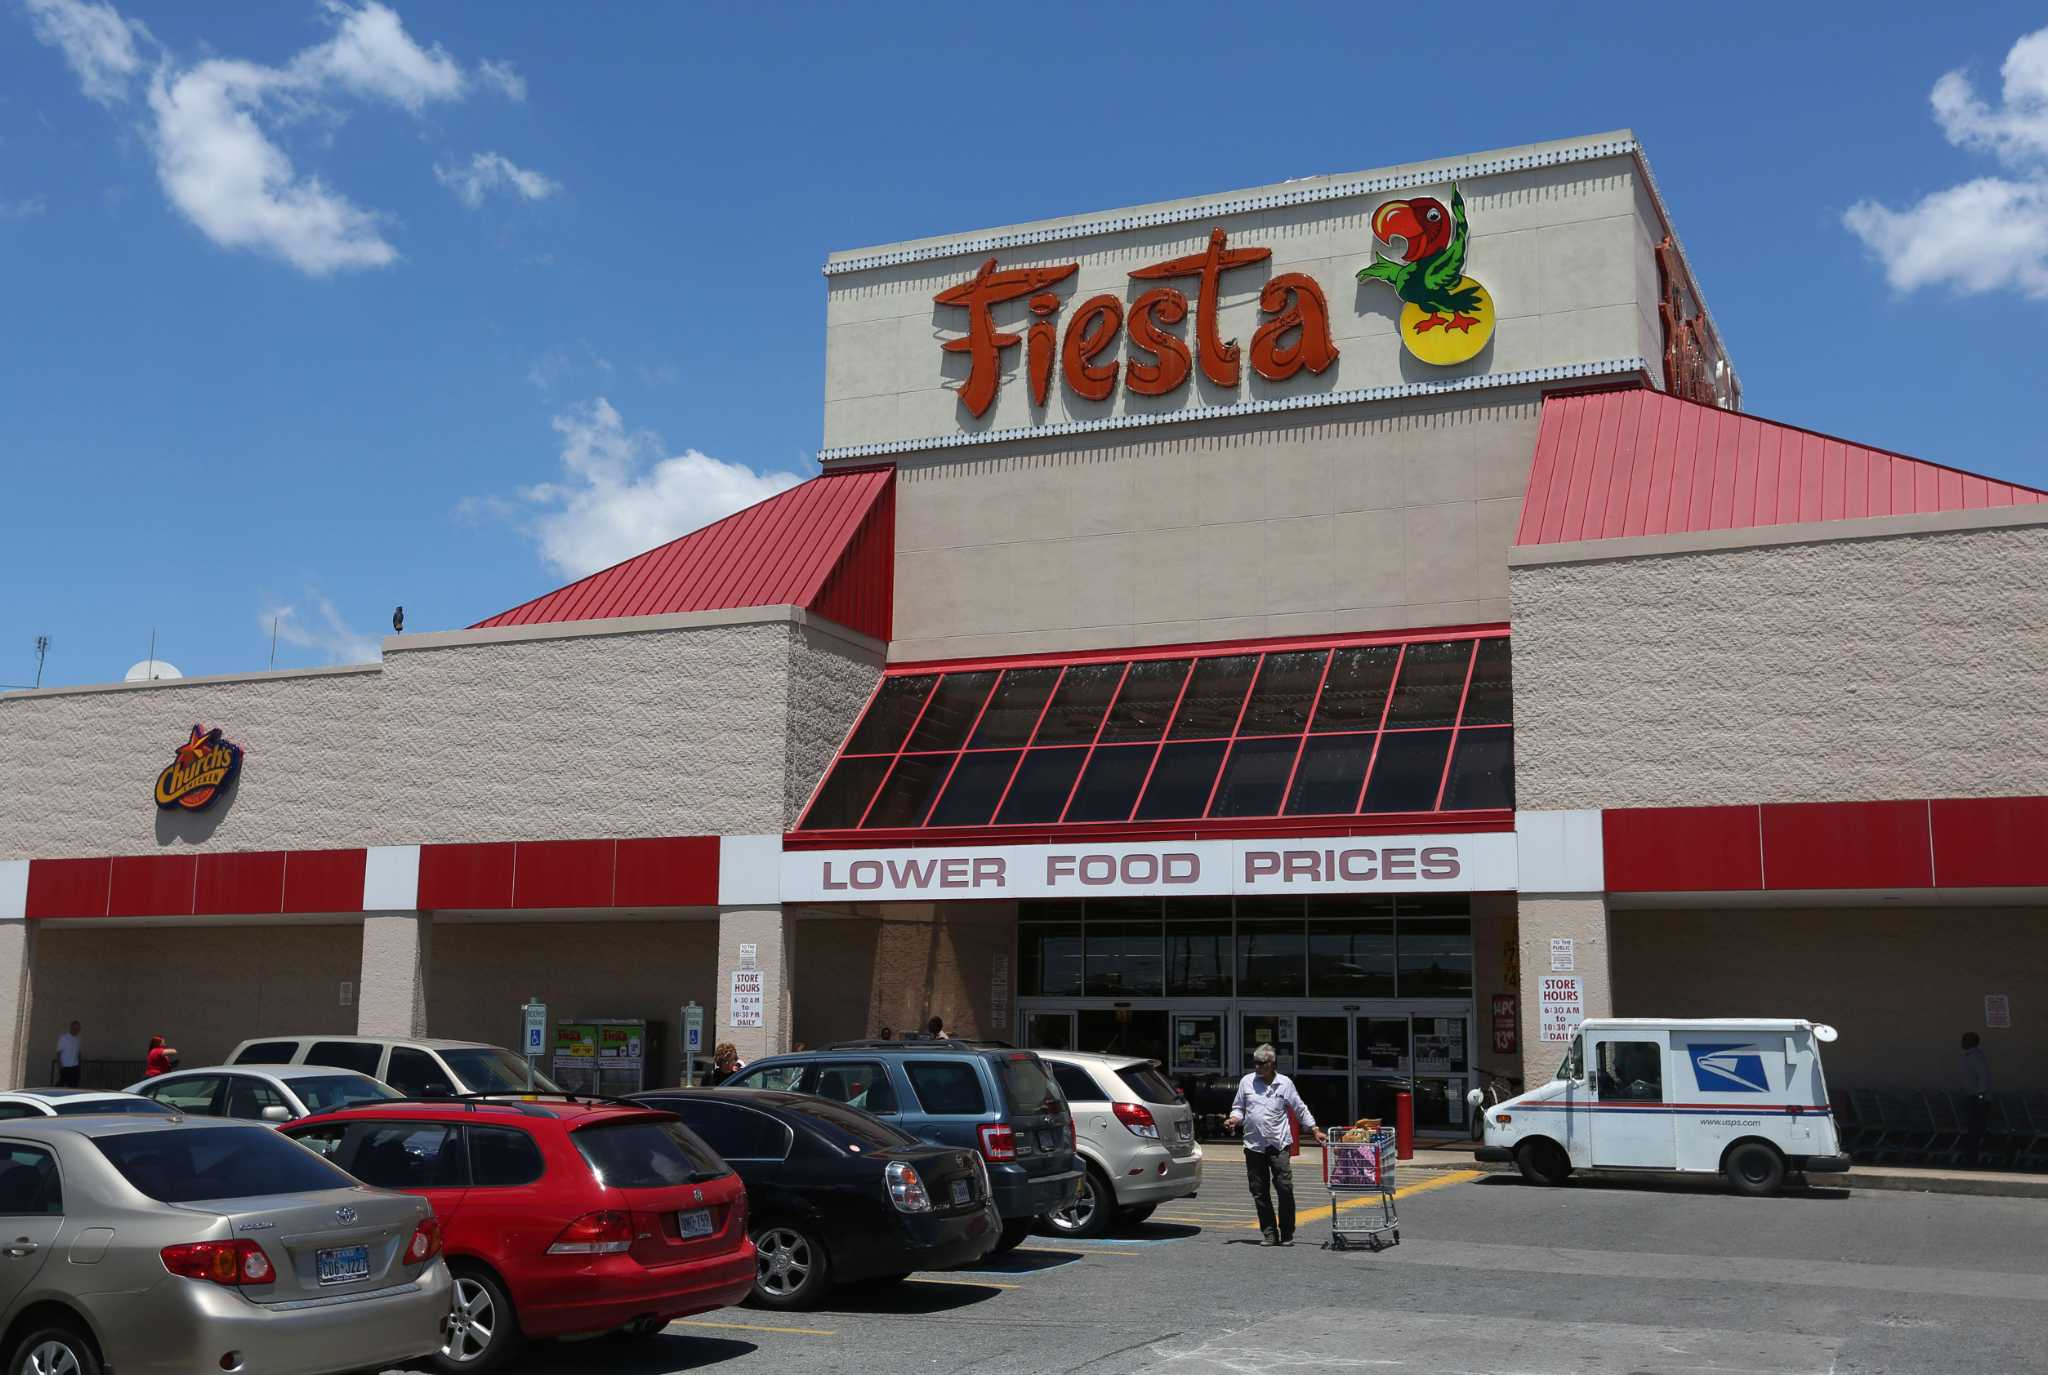 Midtown Fiesta to permanently close 'despite tremendous efforts'